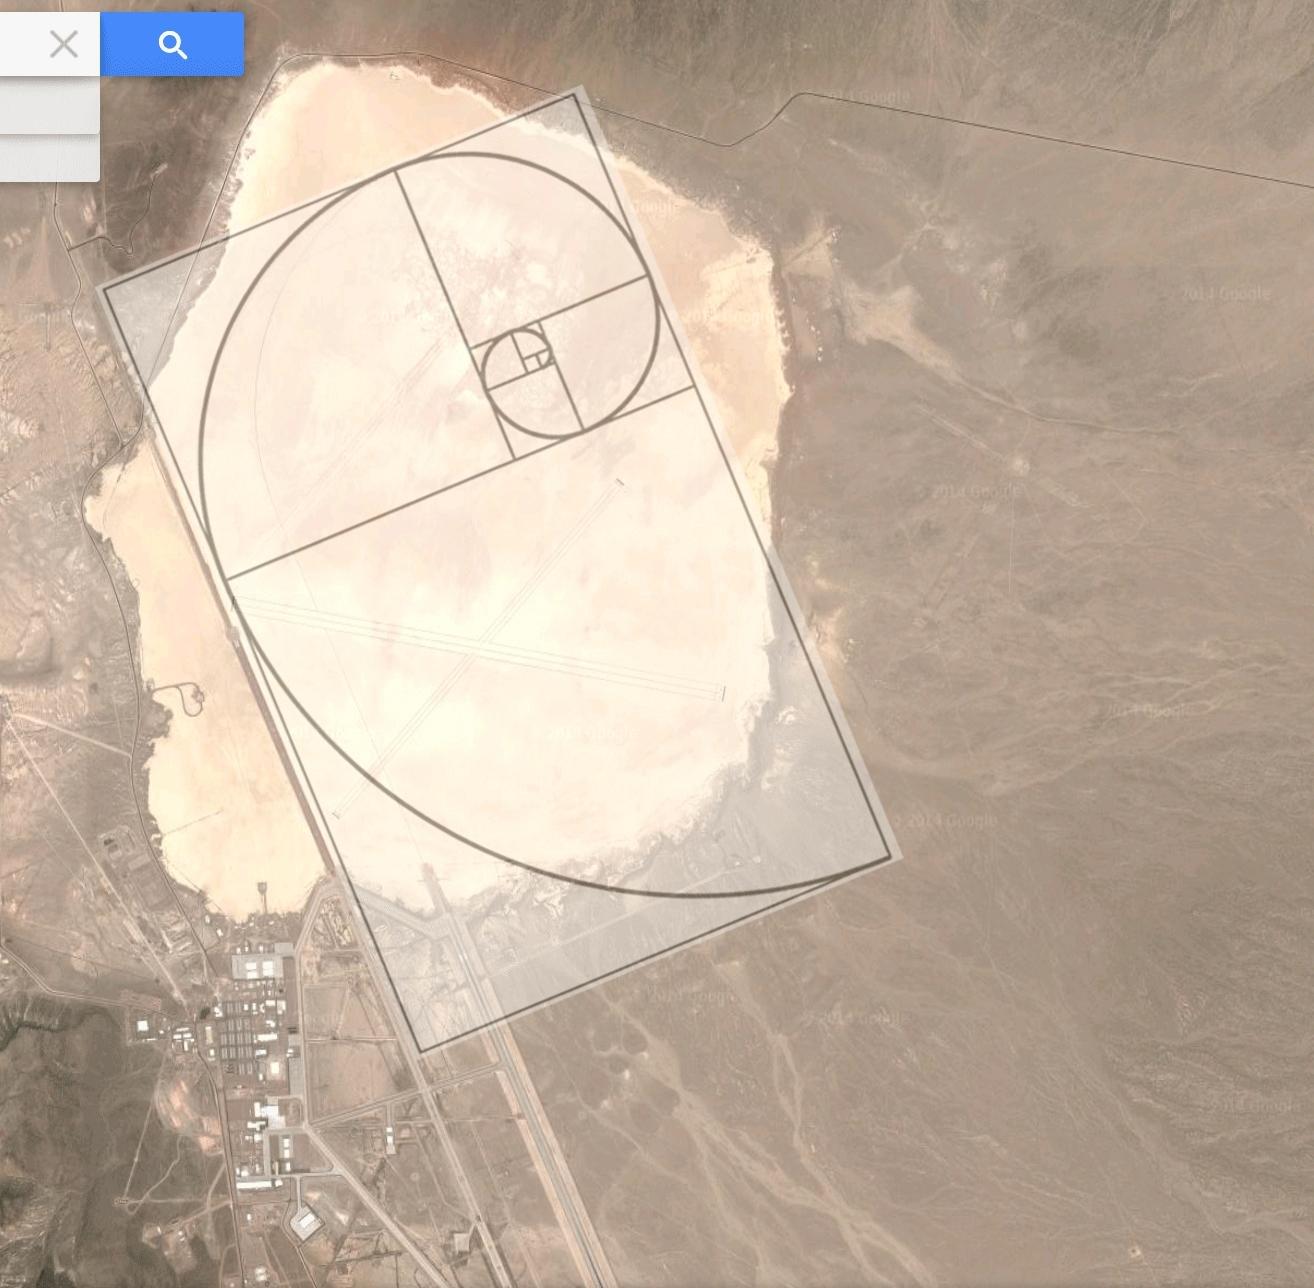 conspiracy, Area51-GoldenSpiral GIFs